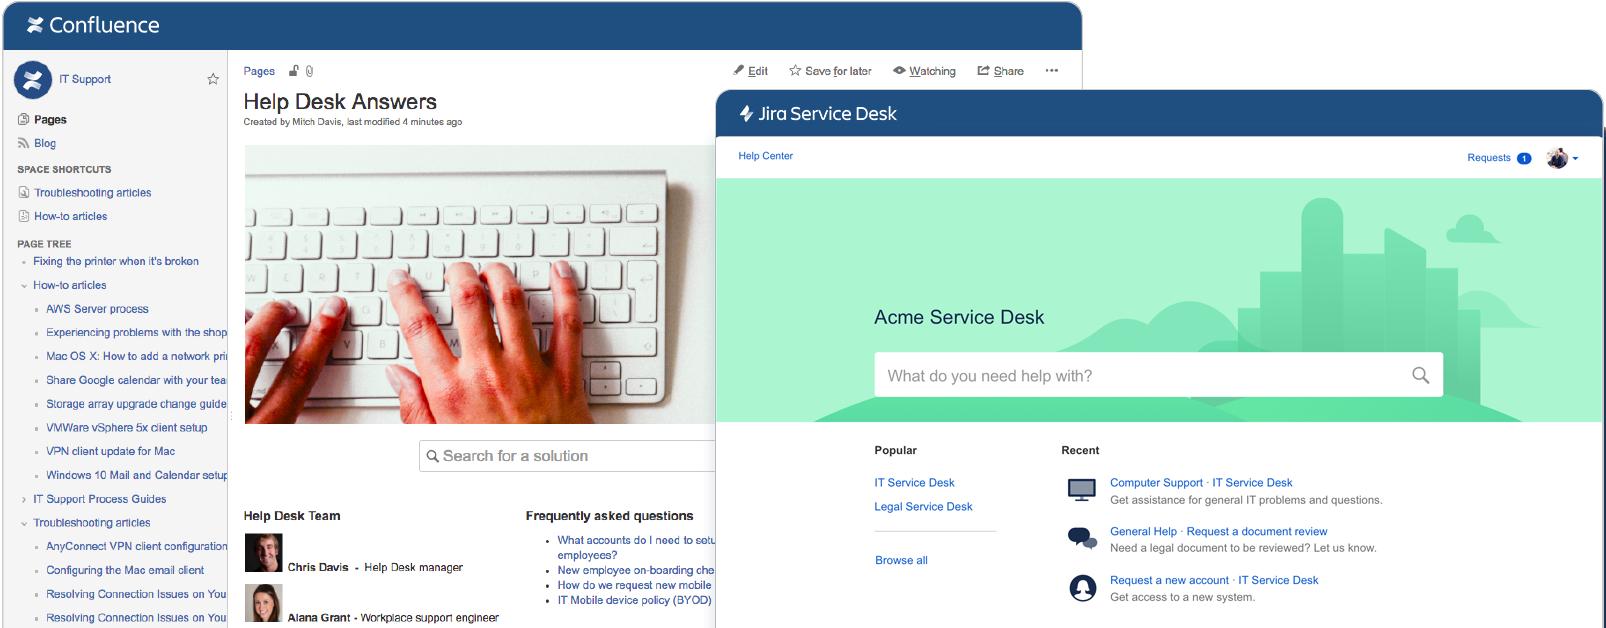 Confluence and Jira Service Desk screenshots